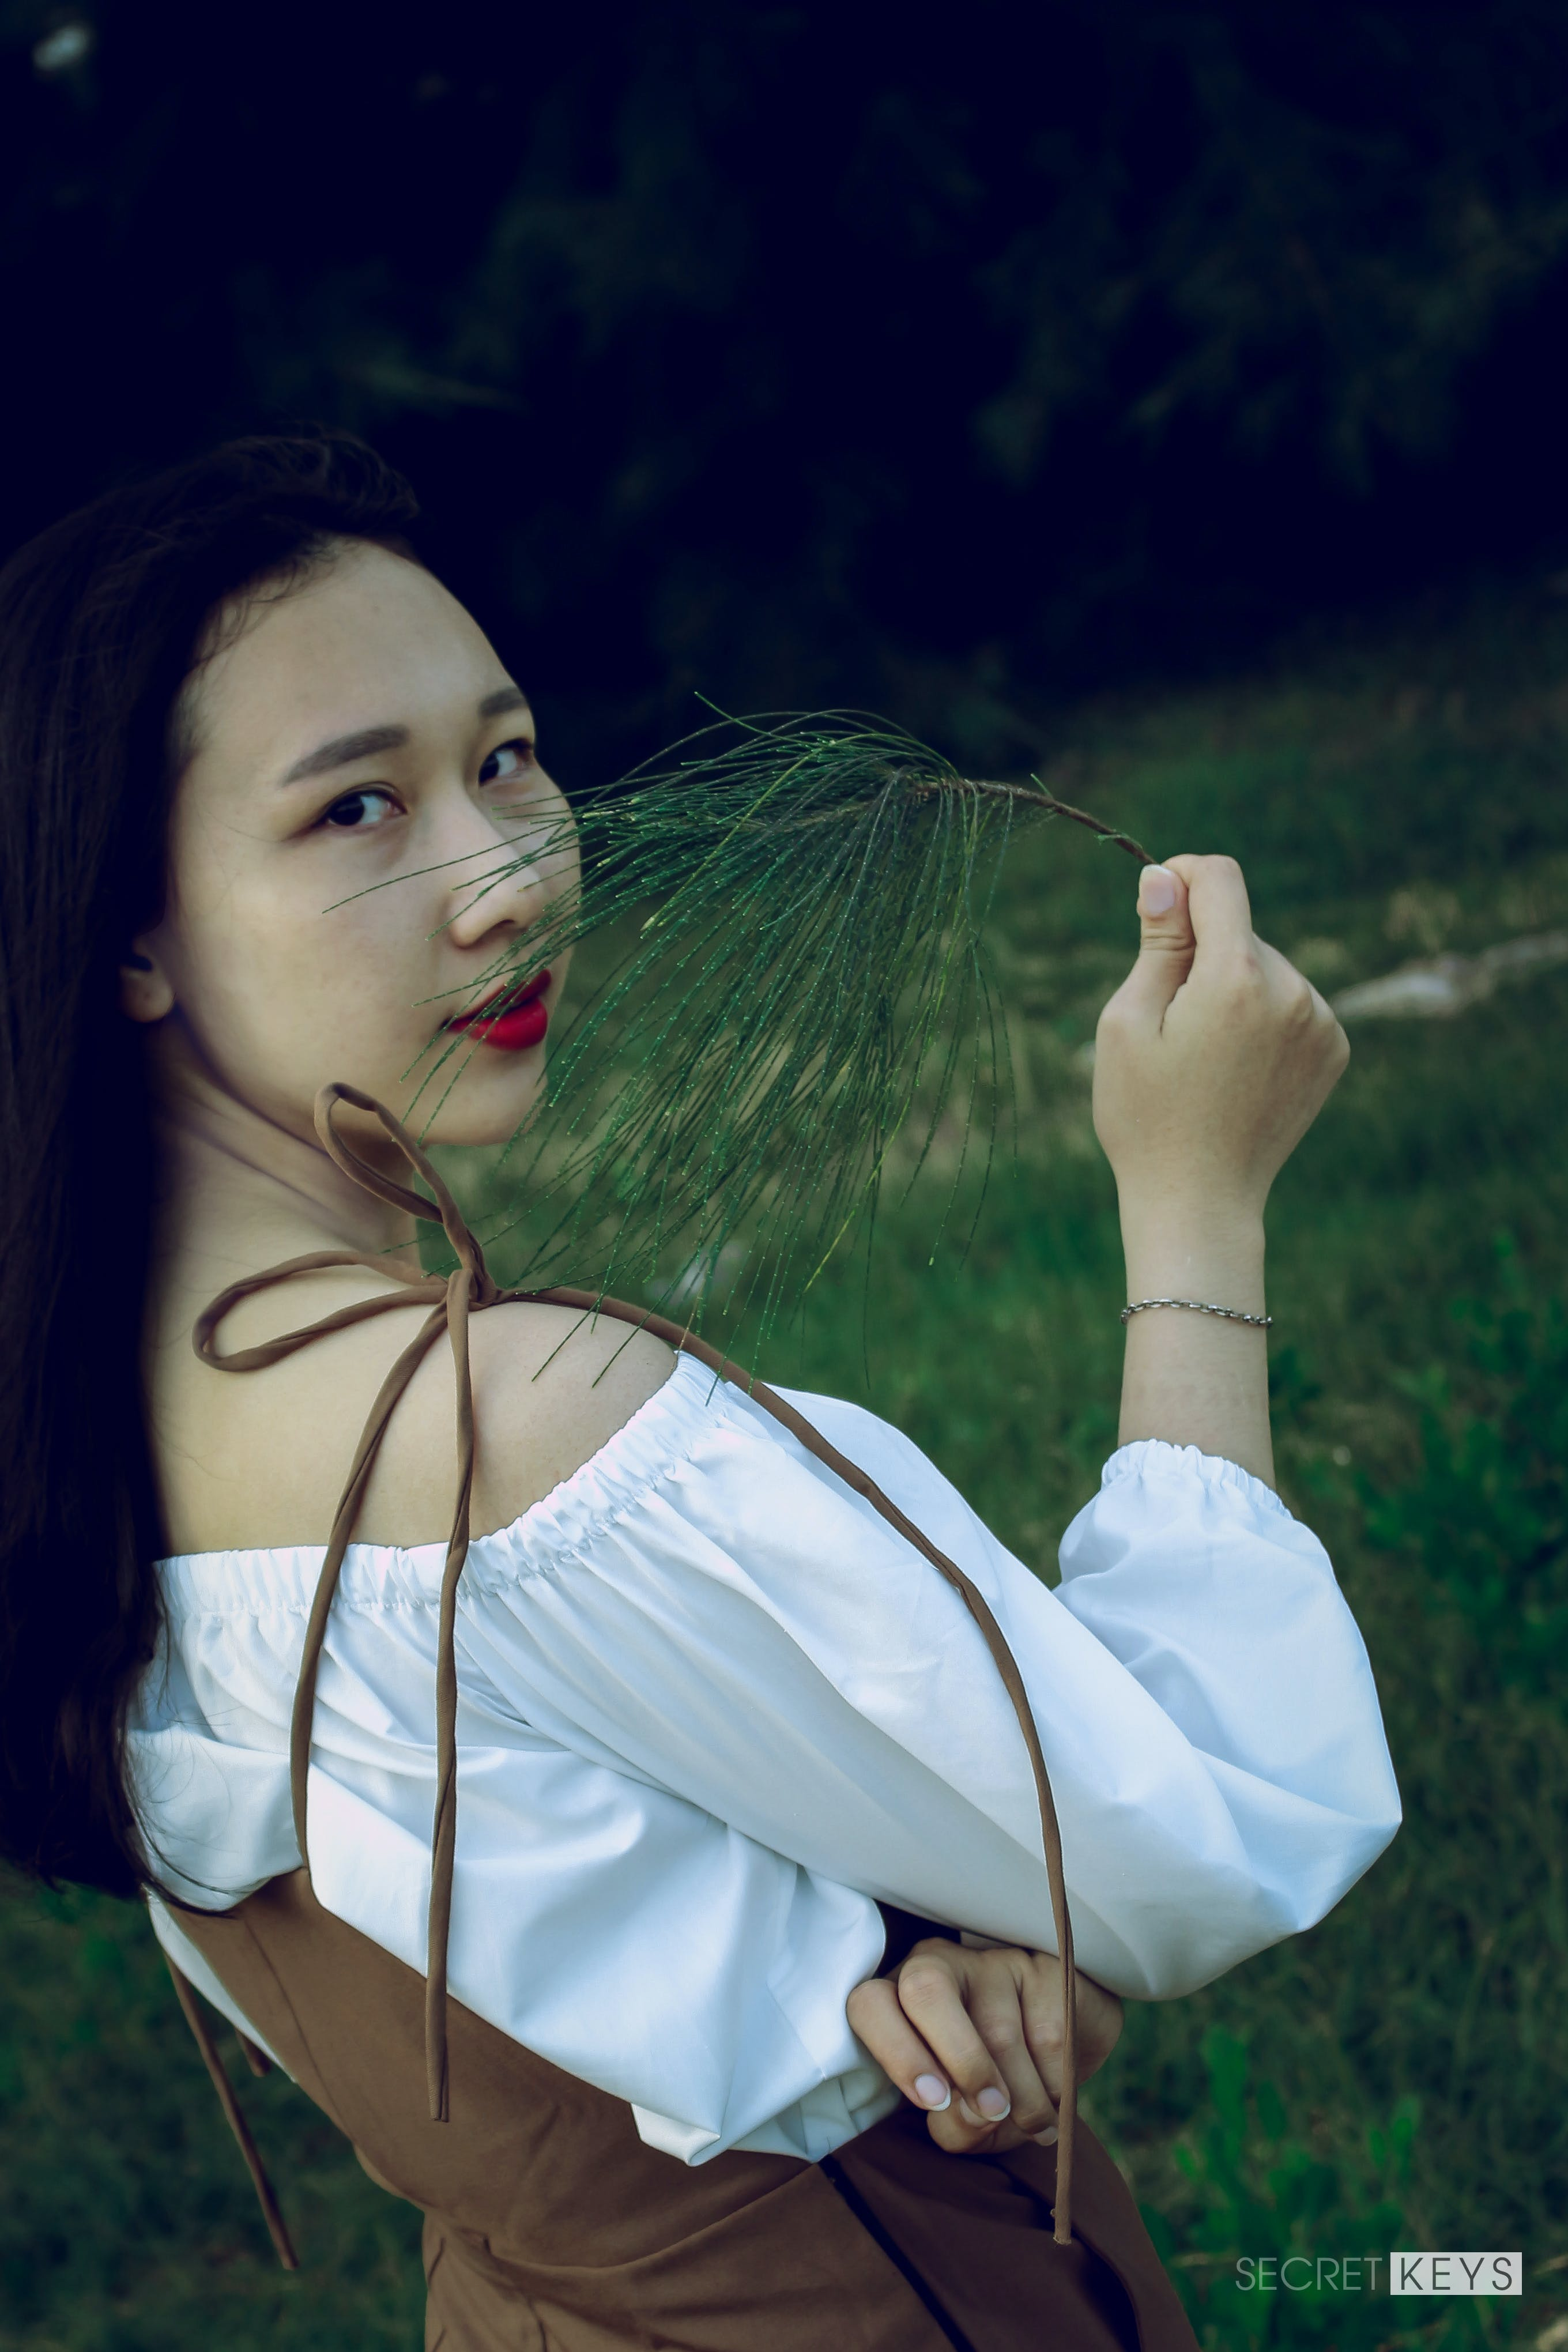 Free stock photo of Asadphoto, asian girl, asian women, eyes